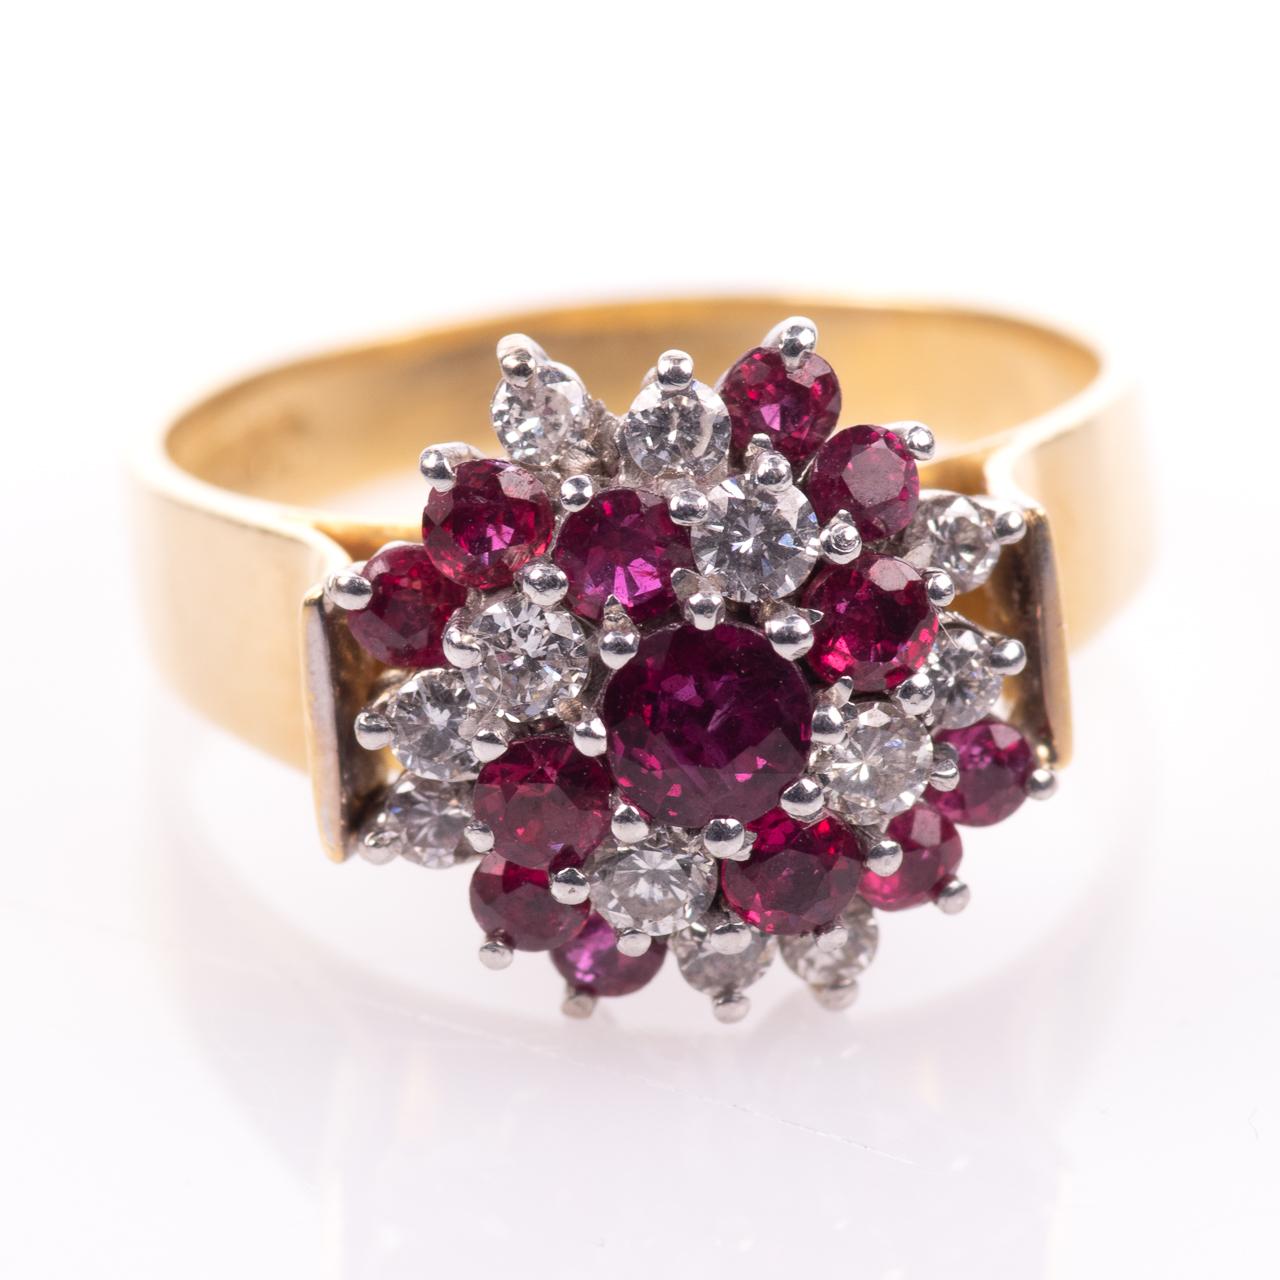 18ct Gold Ruby & 0.35ct Diamond Cluster Ring Hallmarked Birmingham - Image 3 of 7